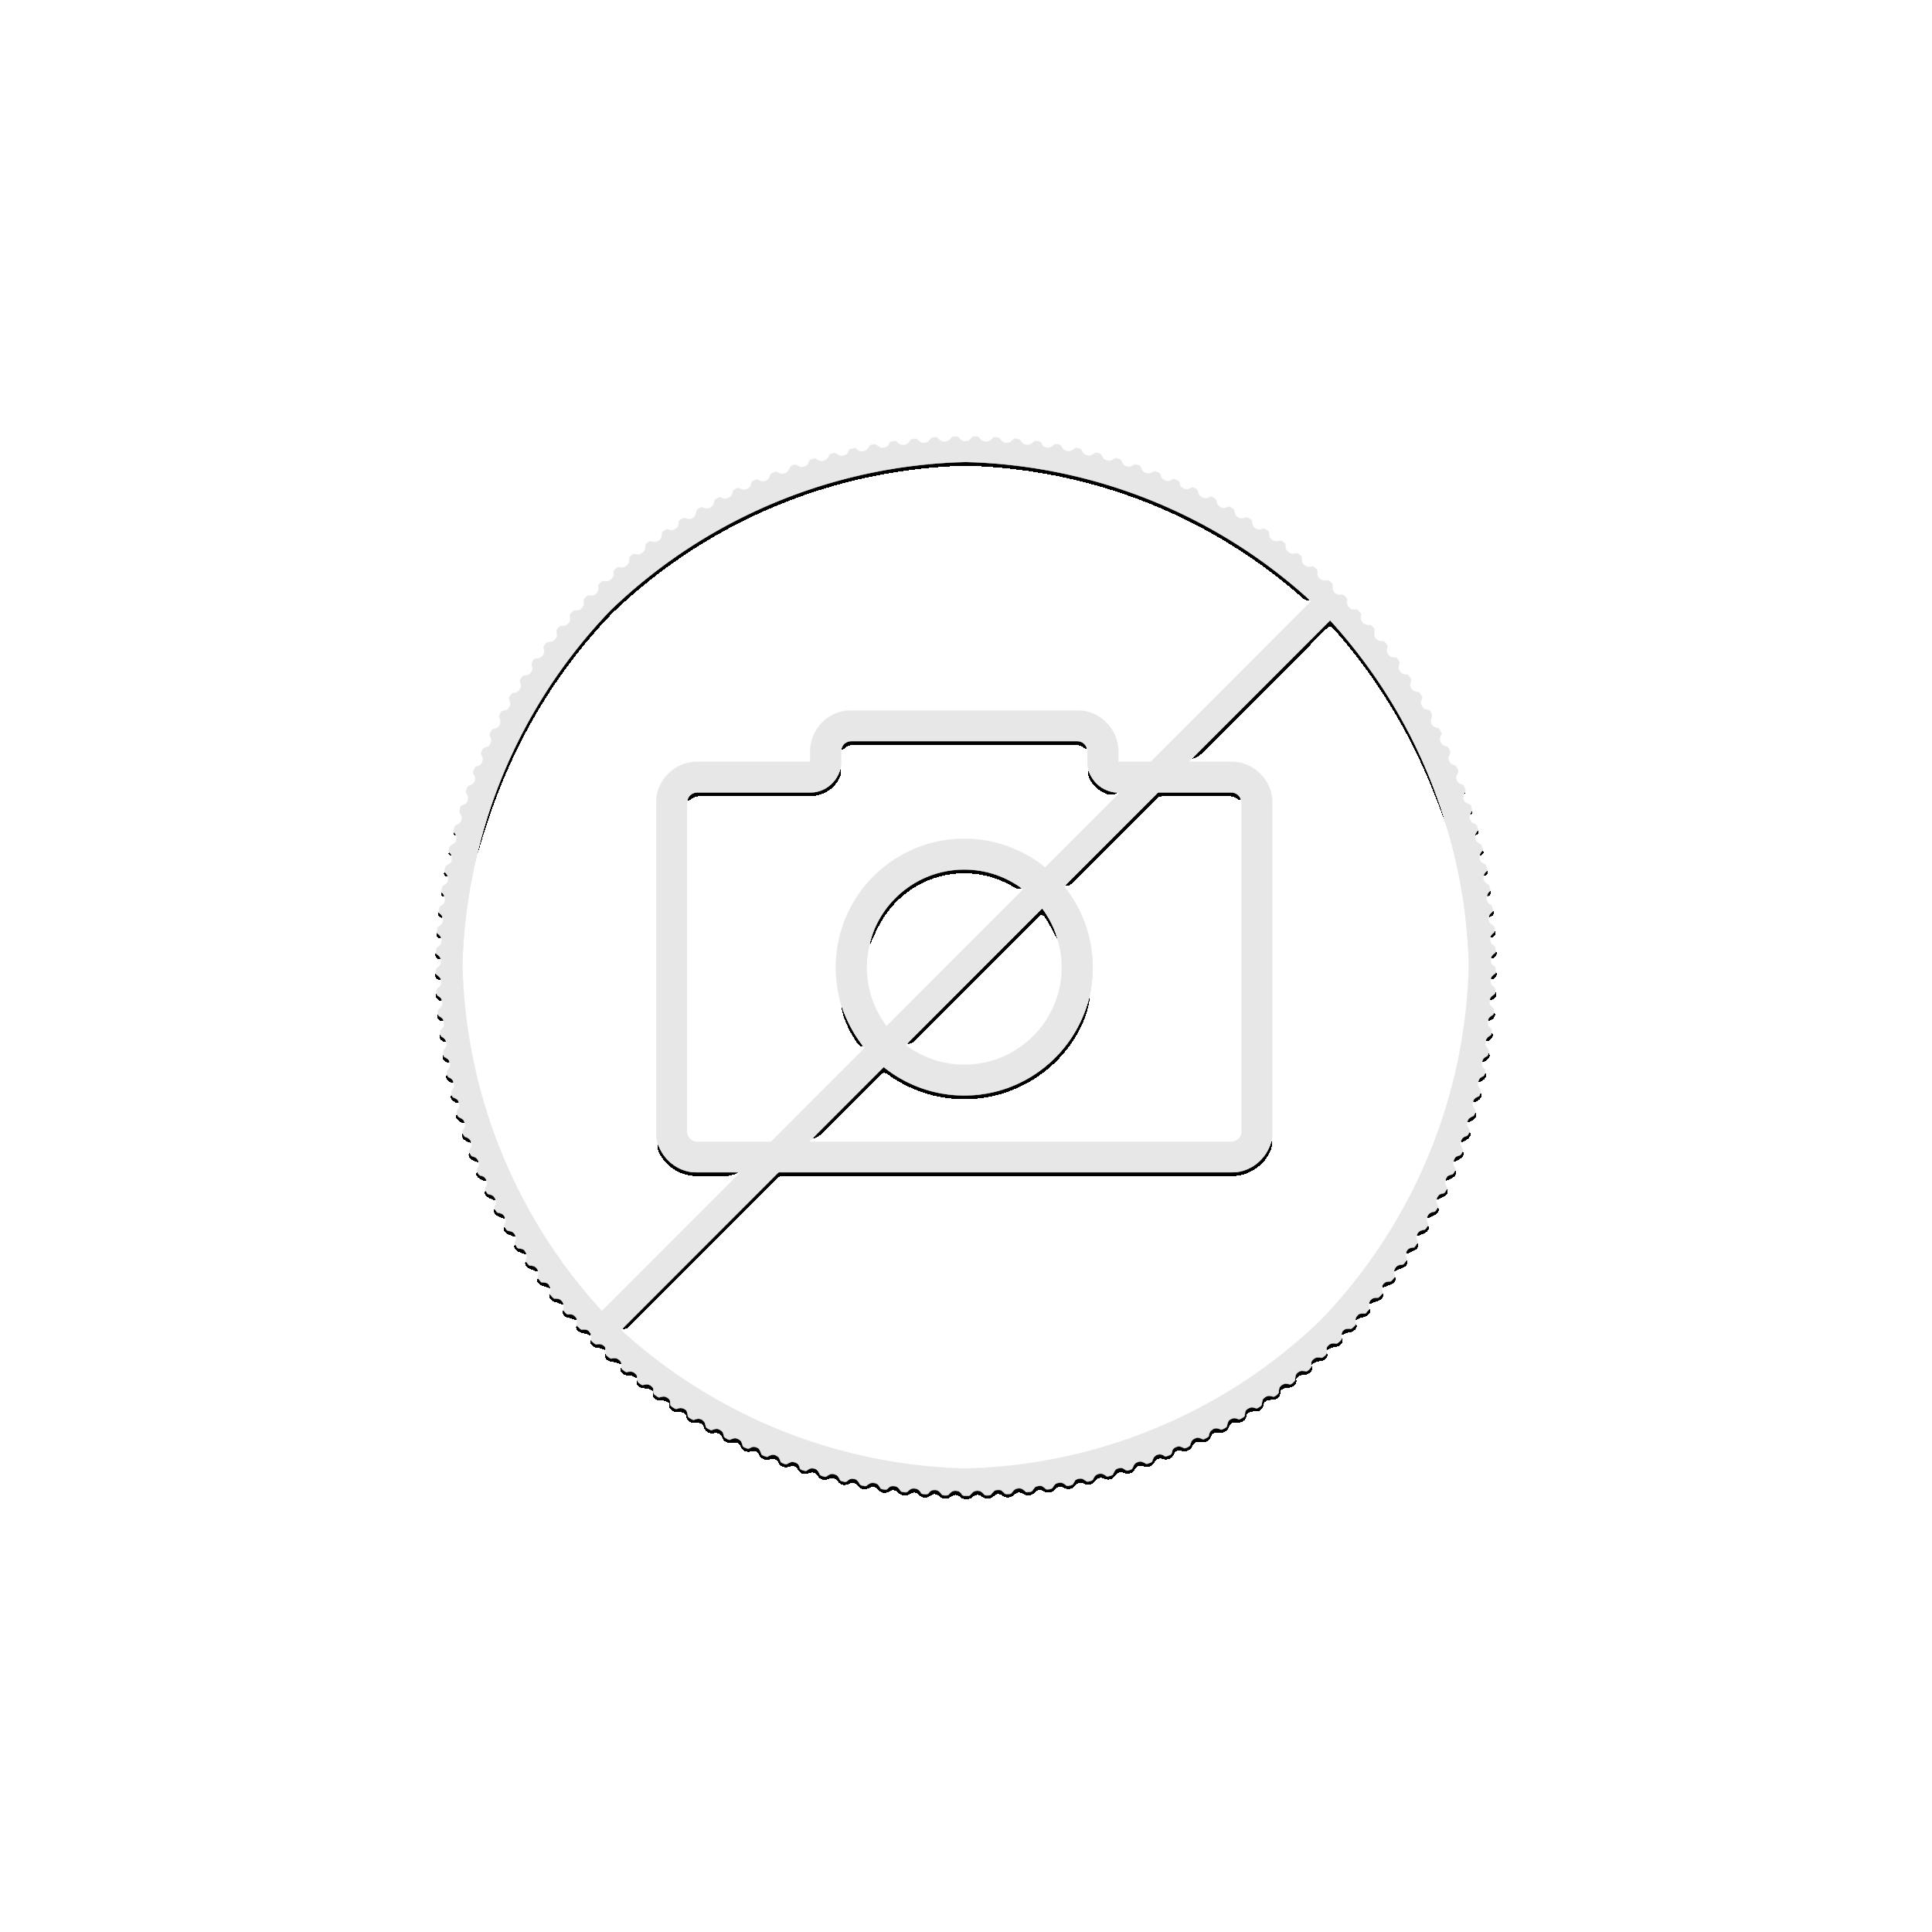 5 delige set gouden panda munten 2020